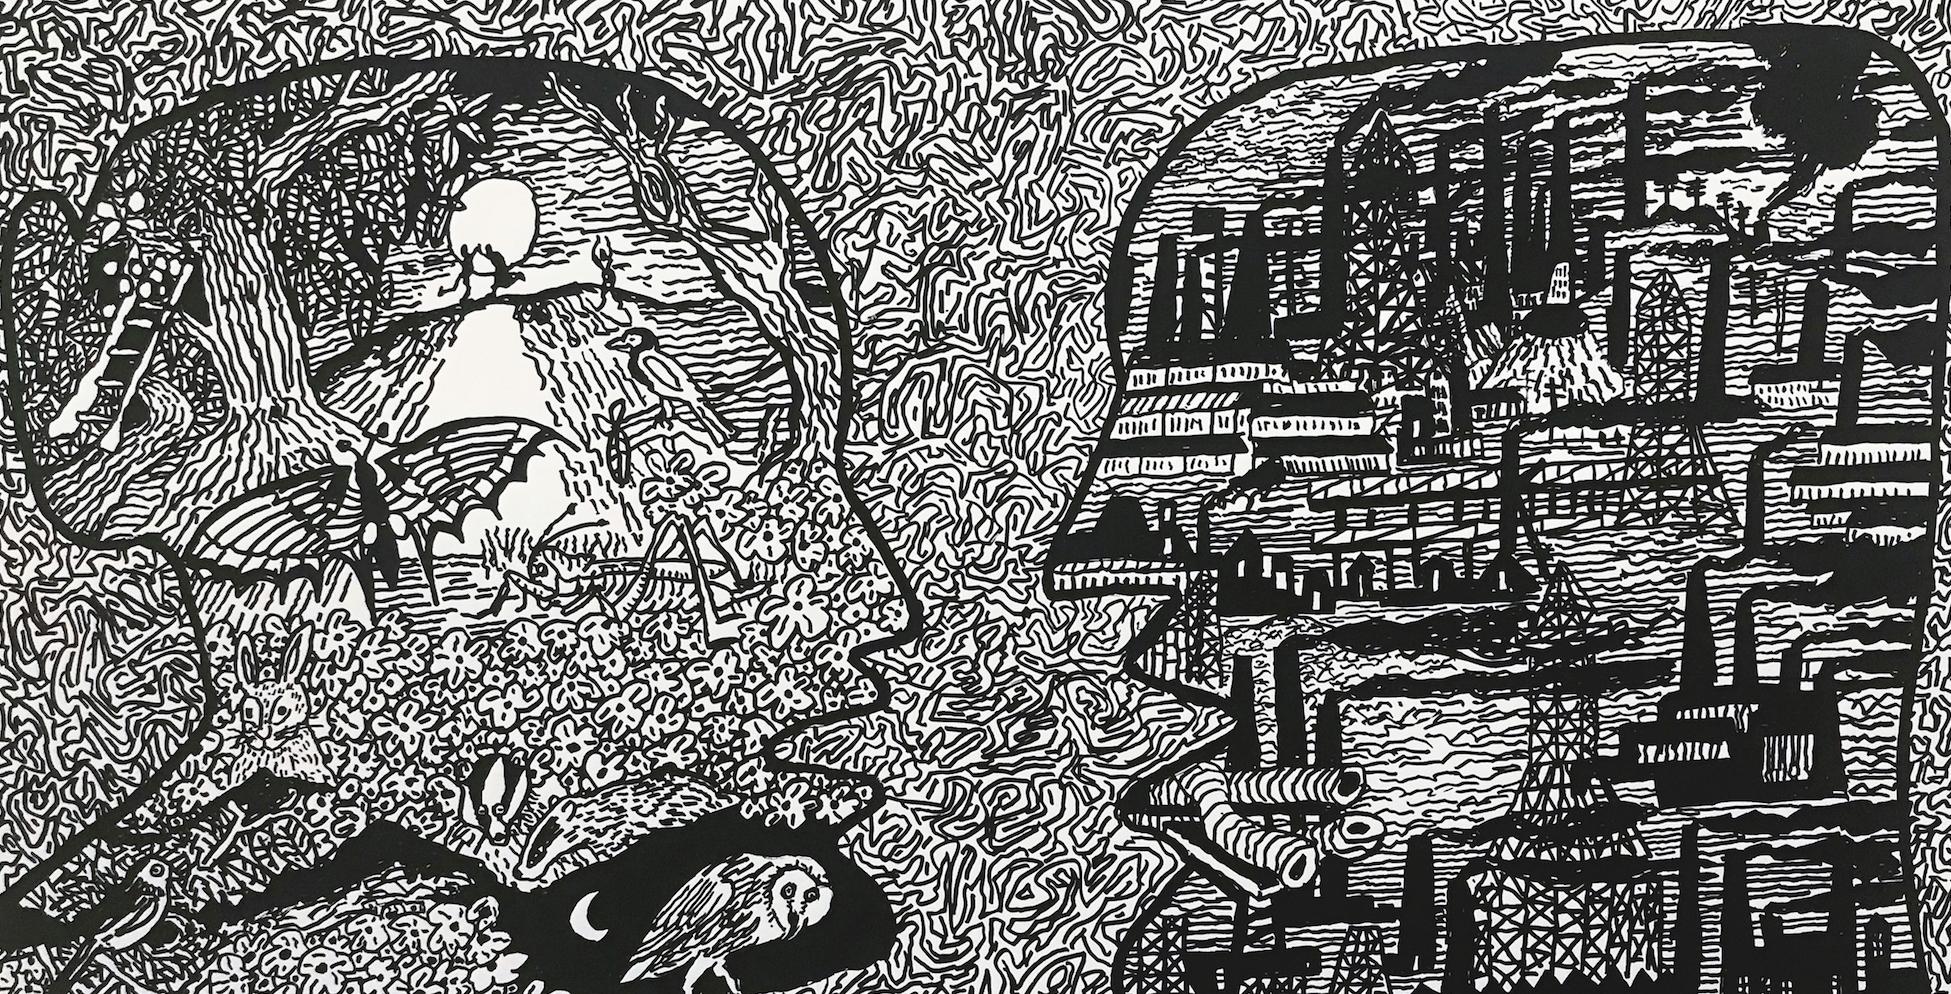 Derek Boshier: Two New Lithographs